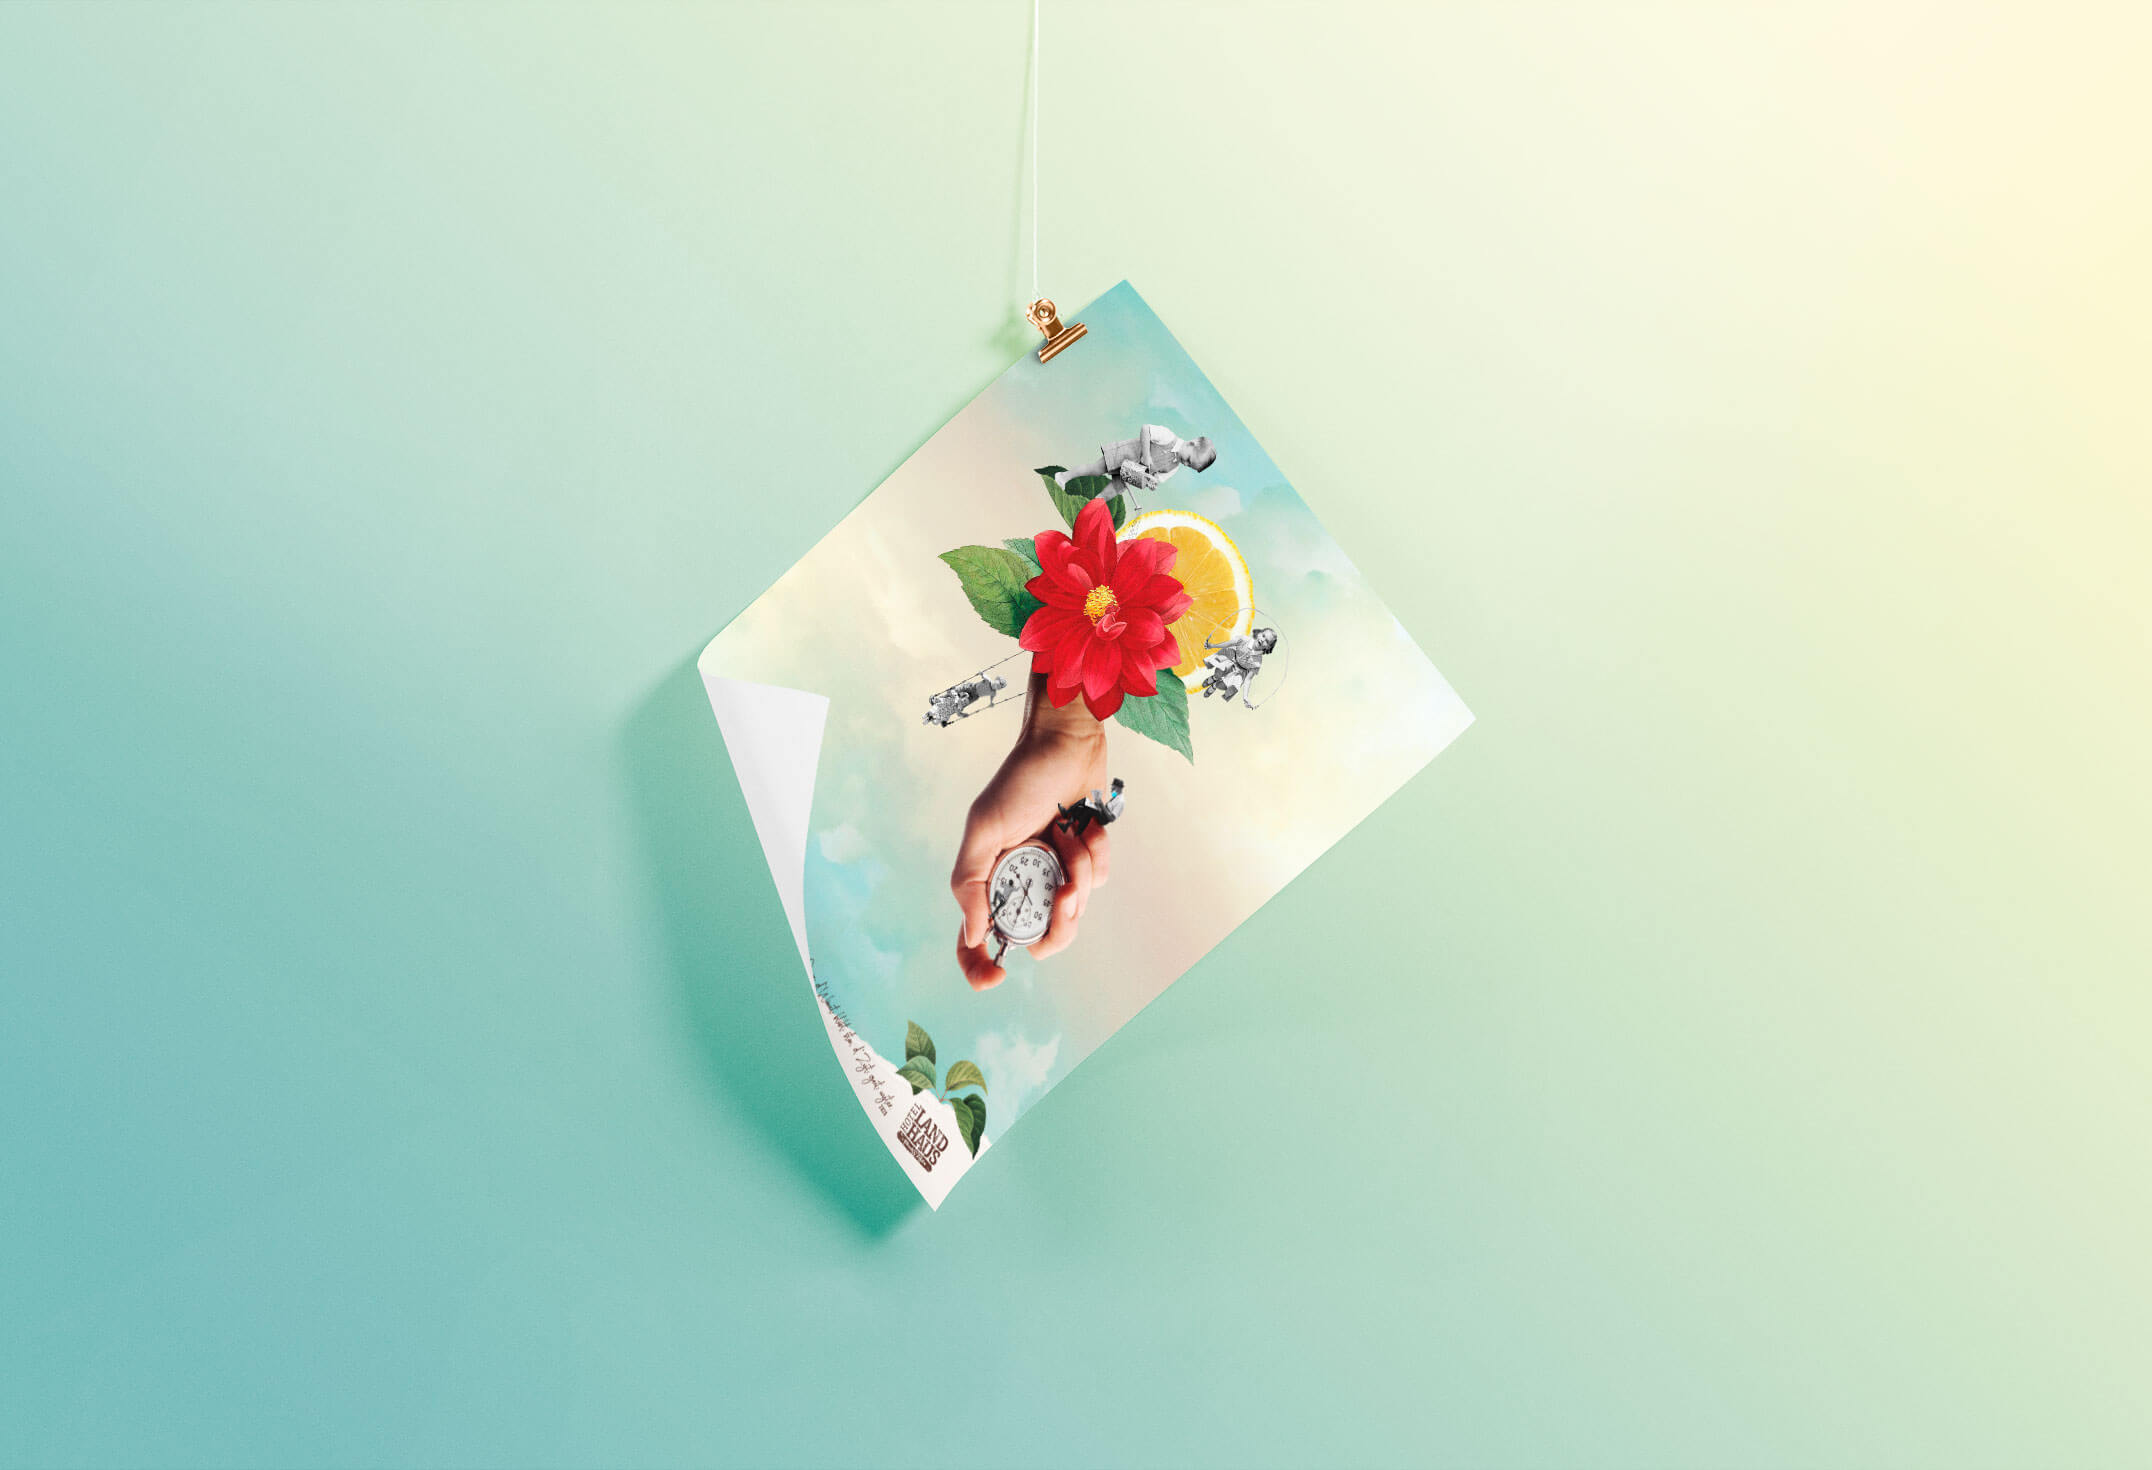 collage poster albert&frida in bern by raissa lara lütolf by studio nux